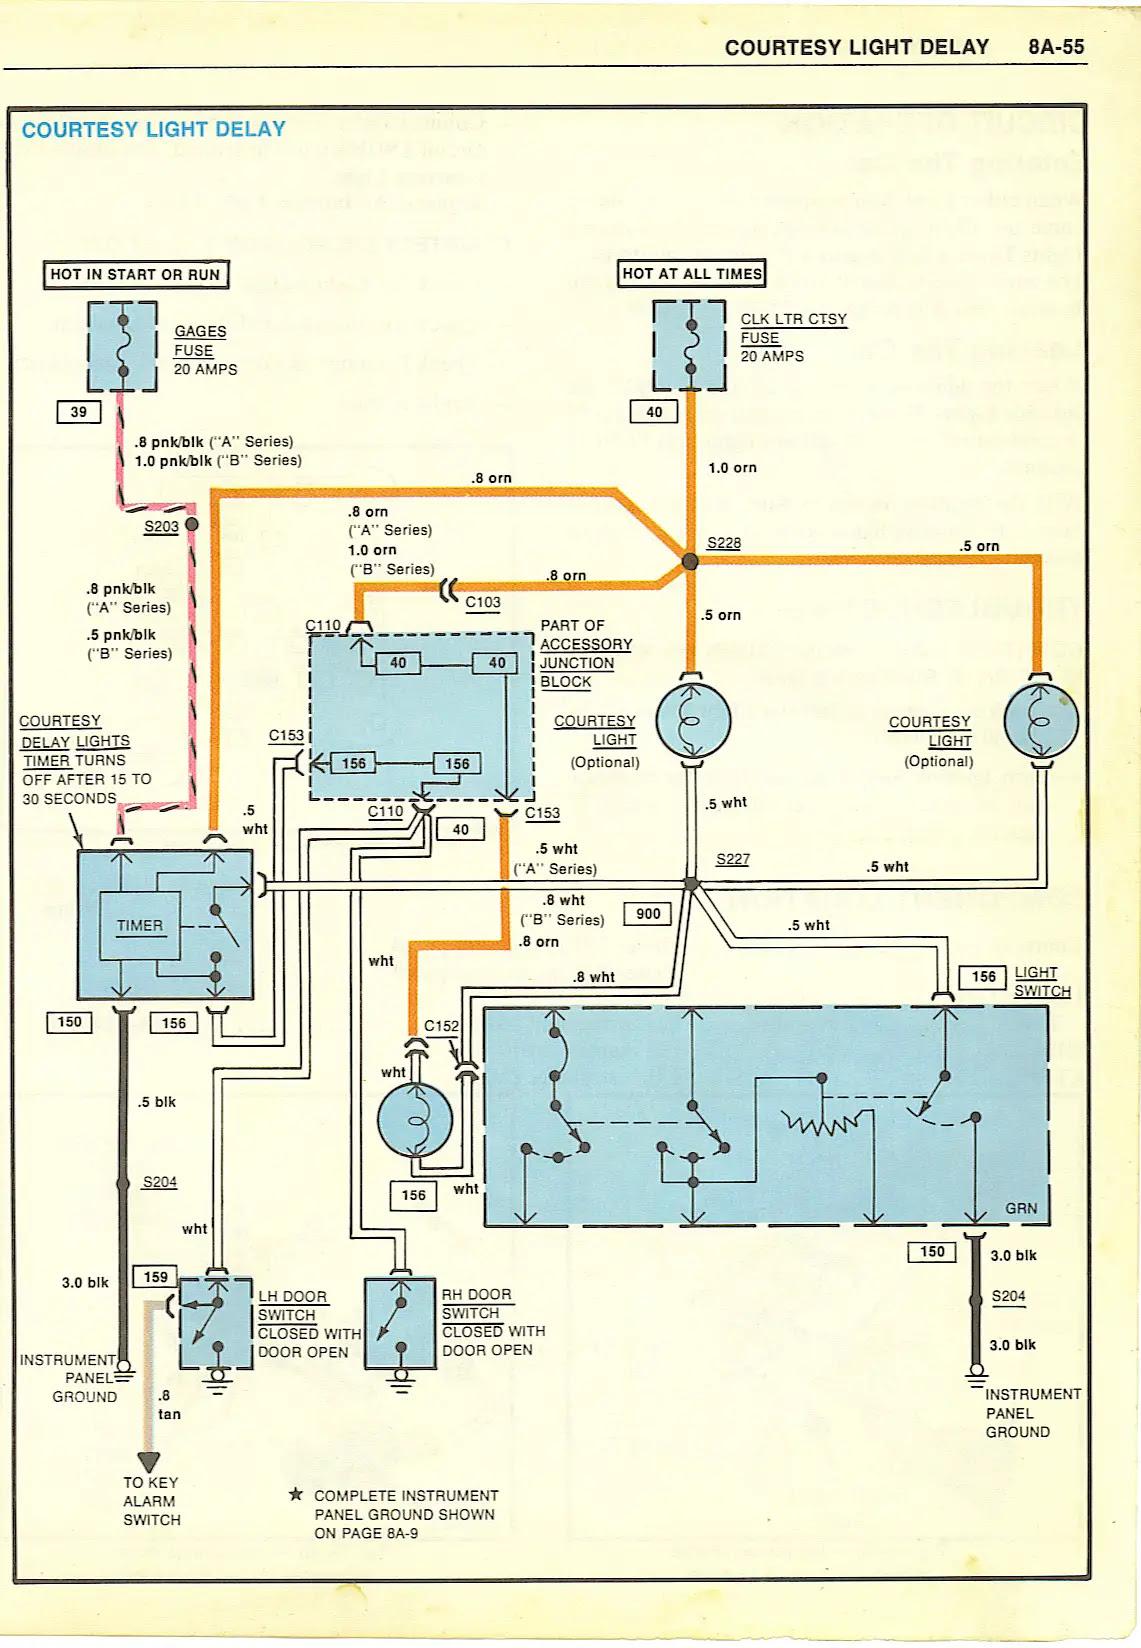 2007 Kenworth W900 Wiring Diagram 1999 Bmw Fuse Box Location Cheerokee Karo Wong Liyo Jeanjaures37 Fr